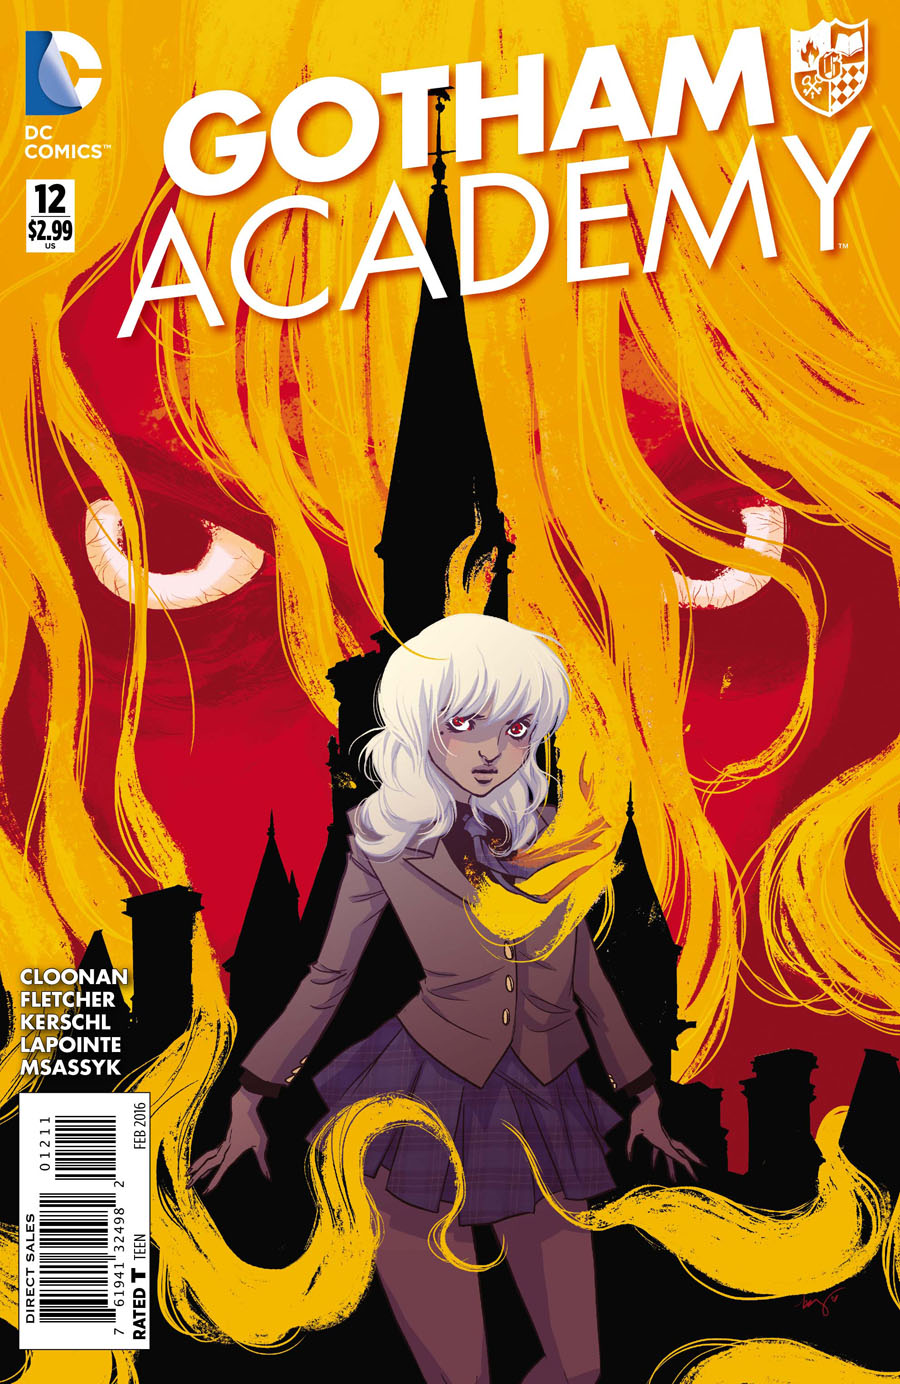 Gotham Academy #12